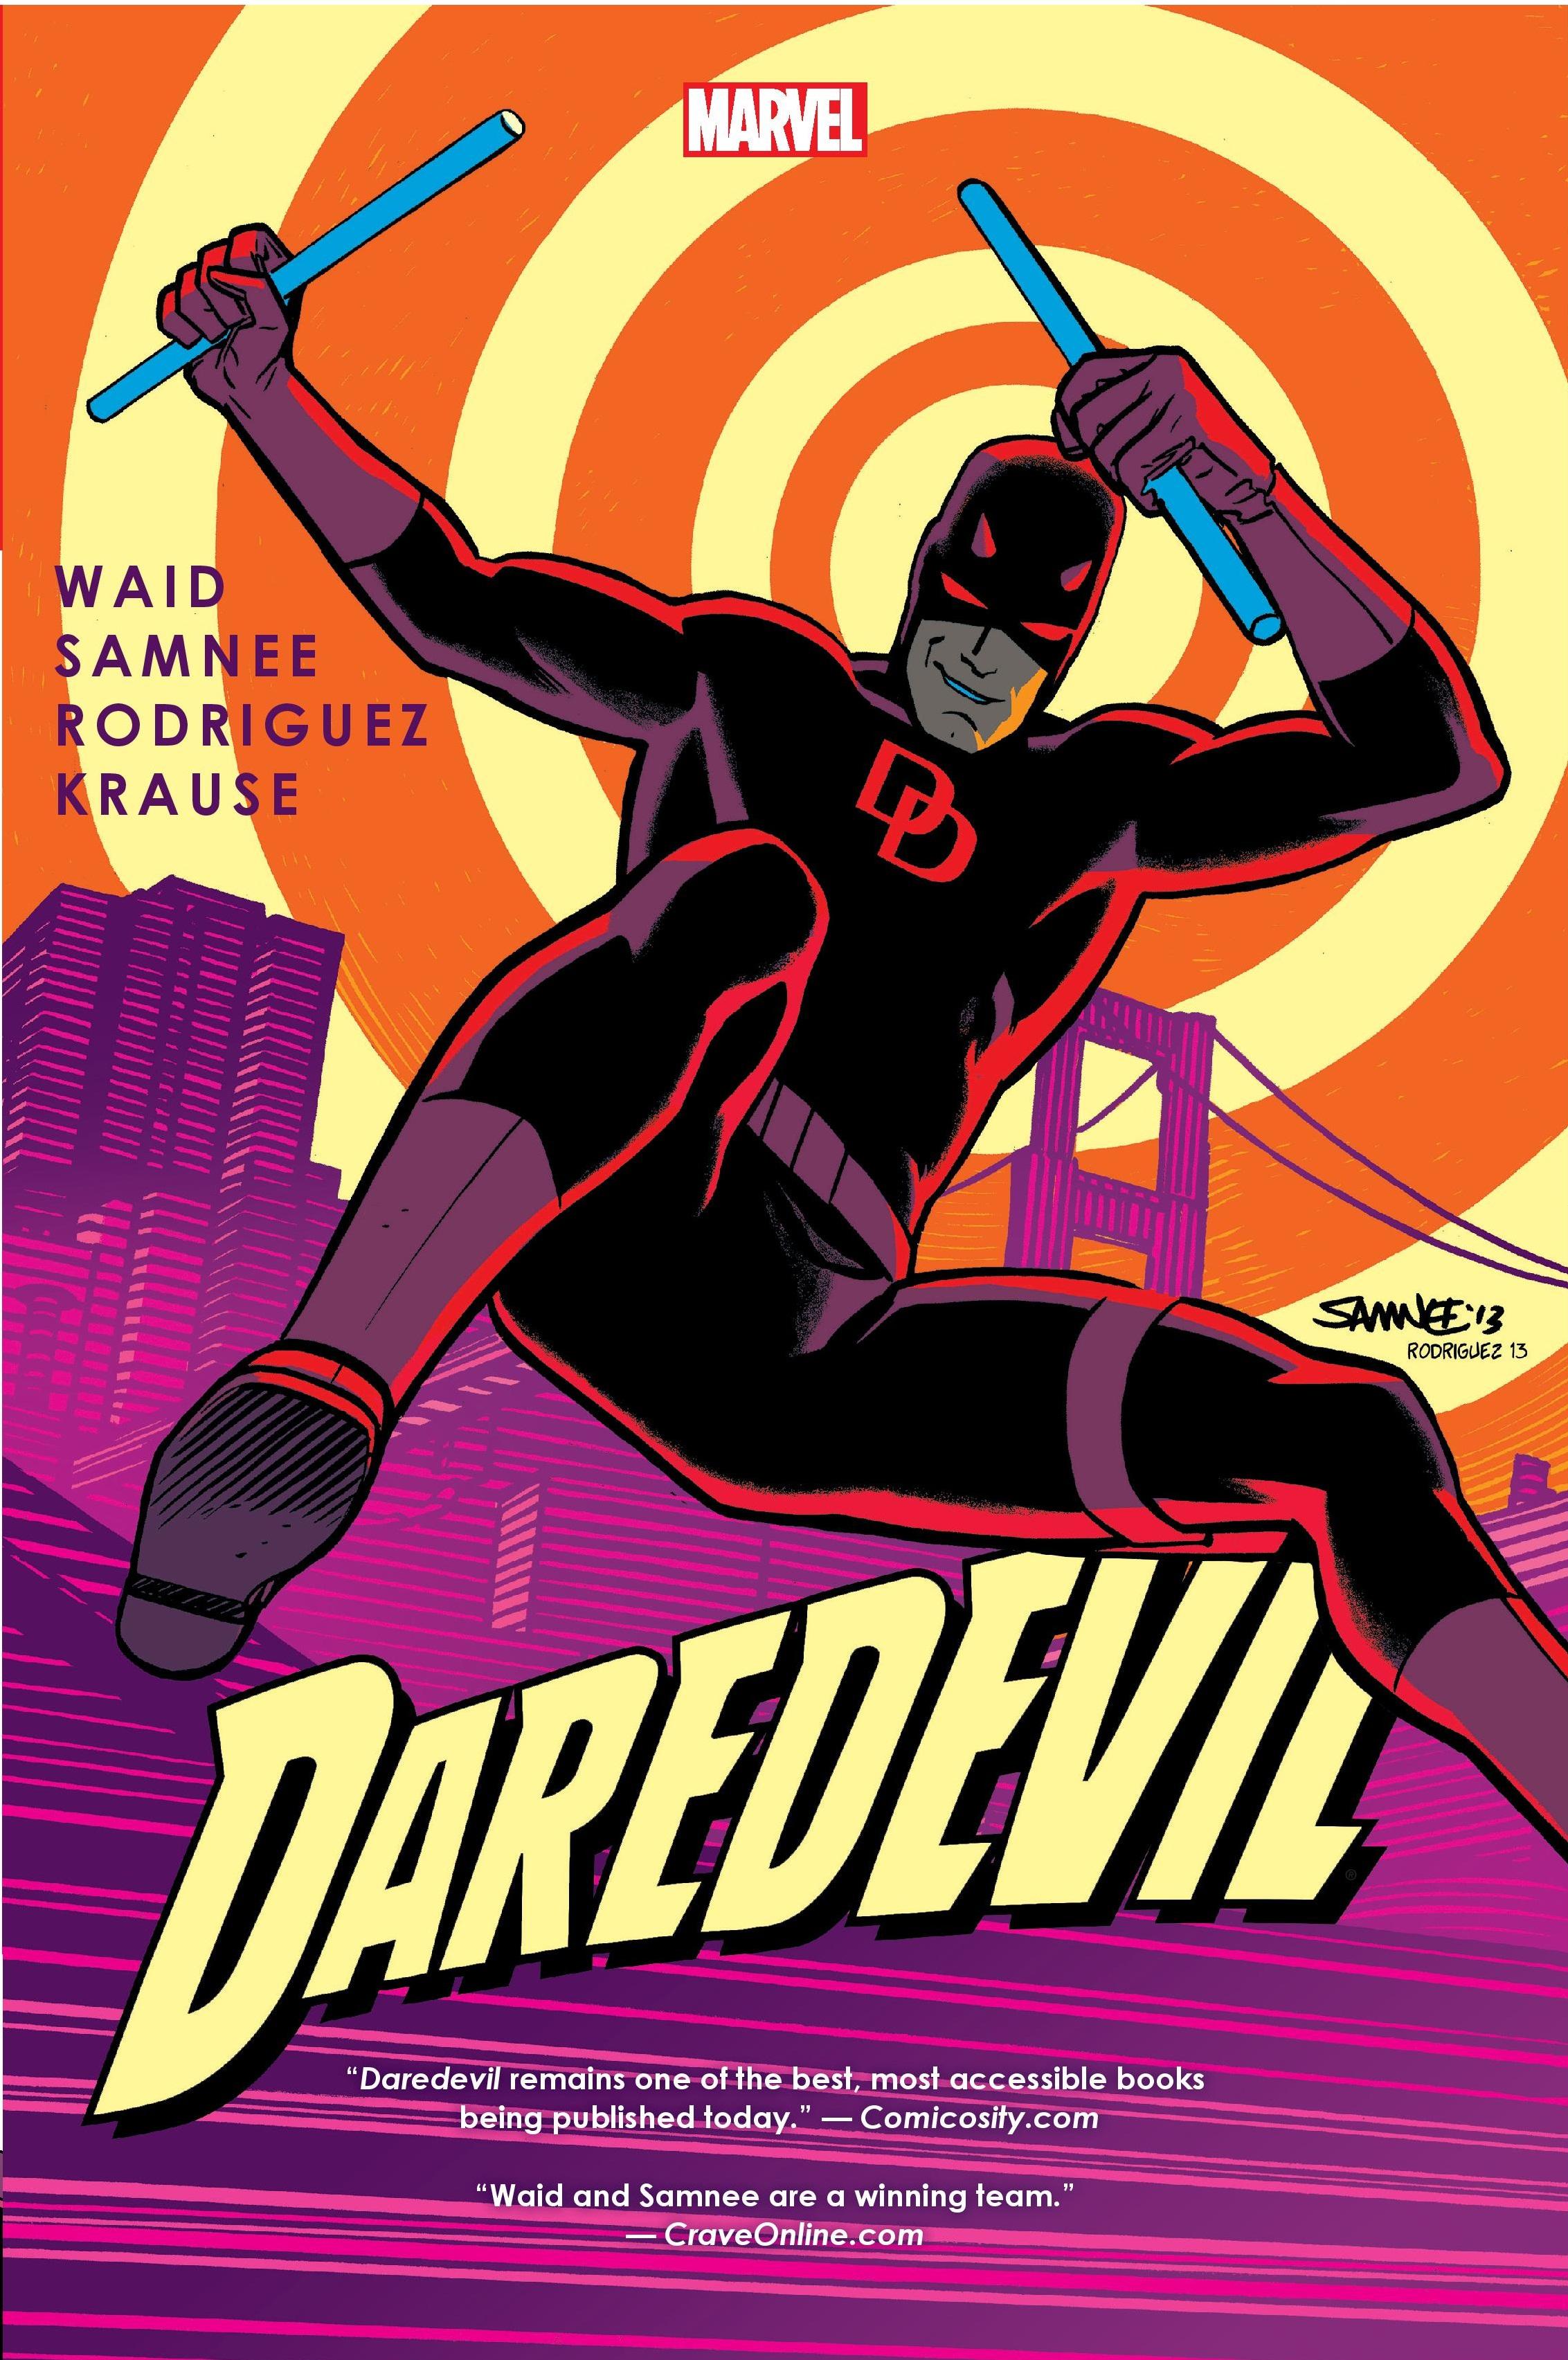 Daredevil by Mark Waid & Chris Samnee Vol. 4 (Hardcover)